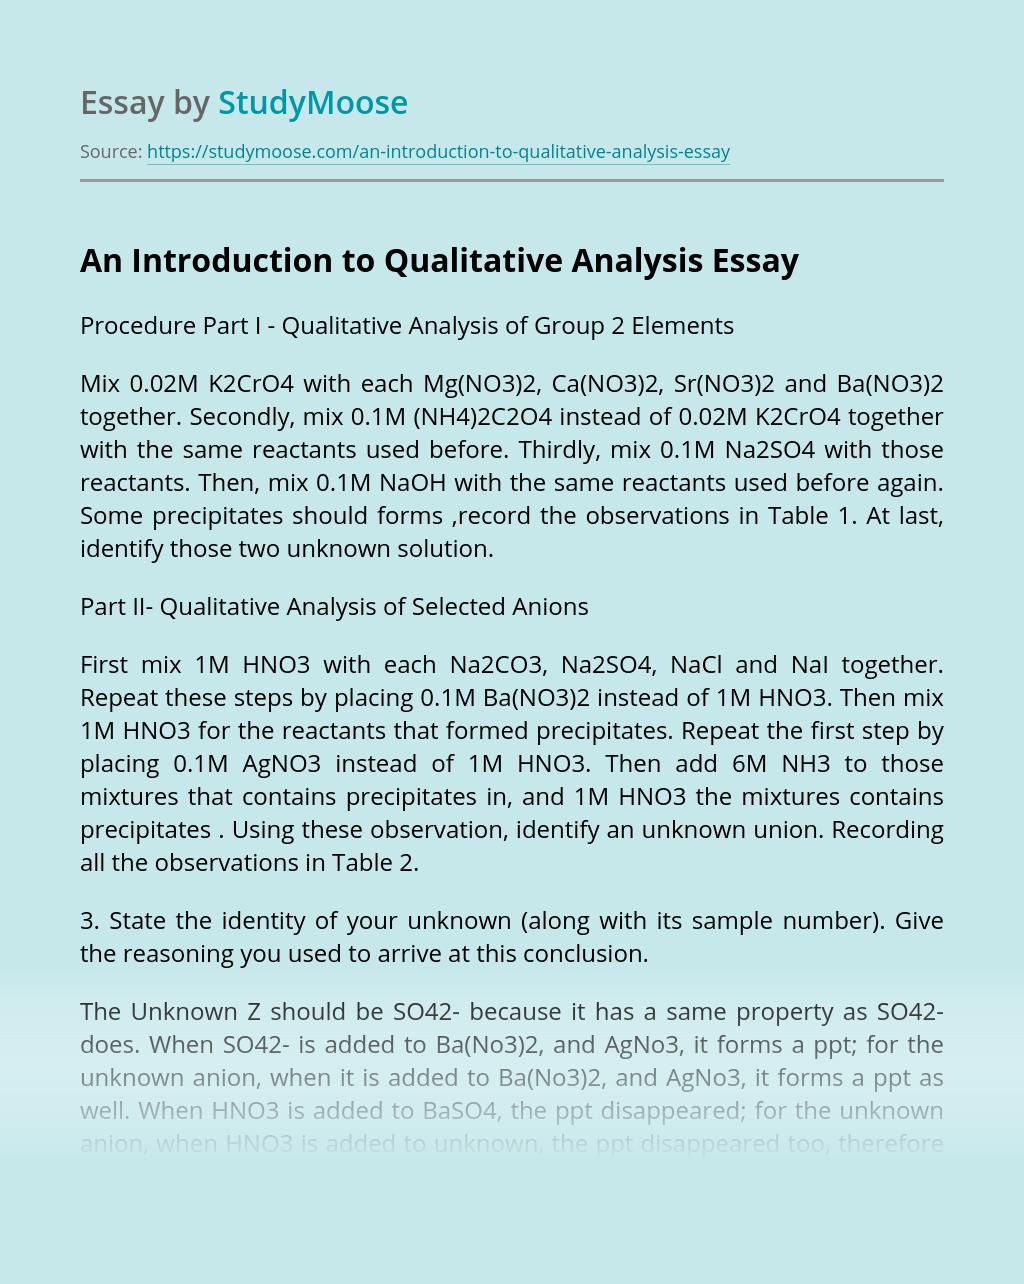 An Introduction to Qualitative Analysis